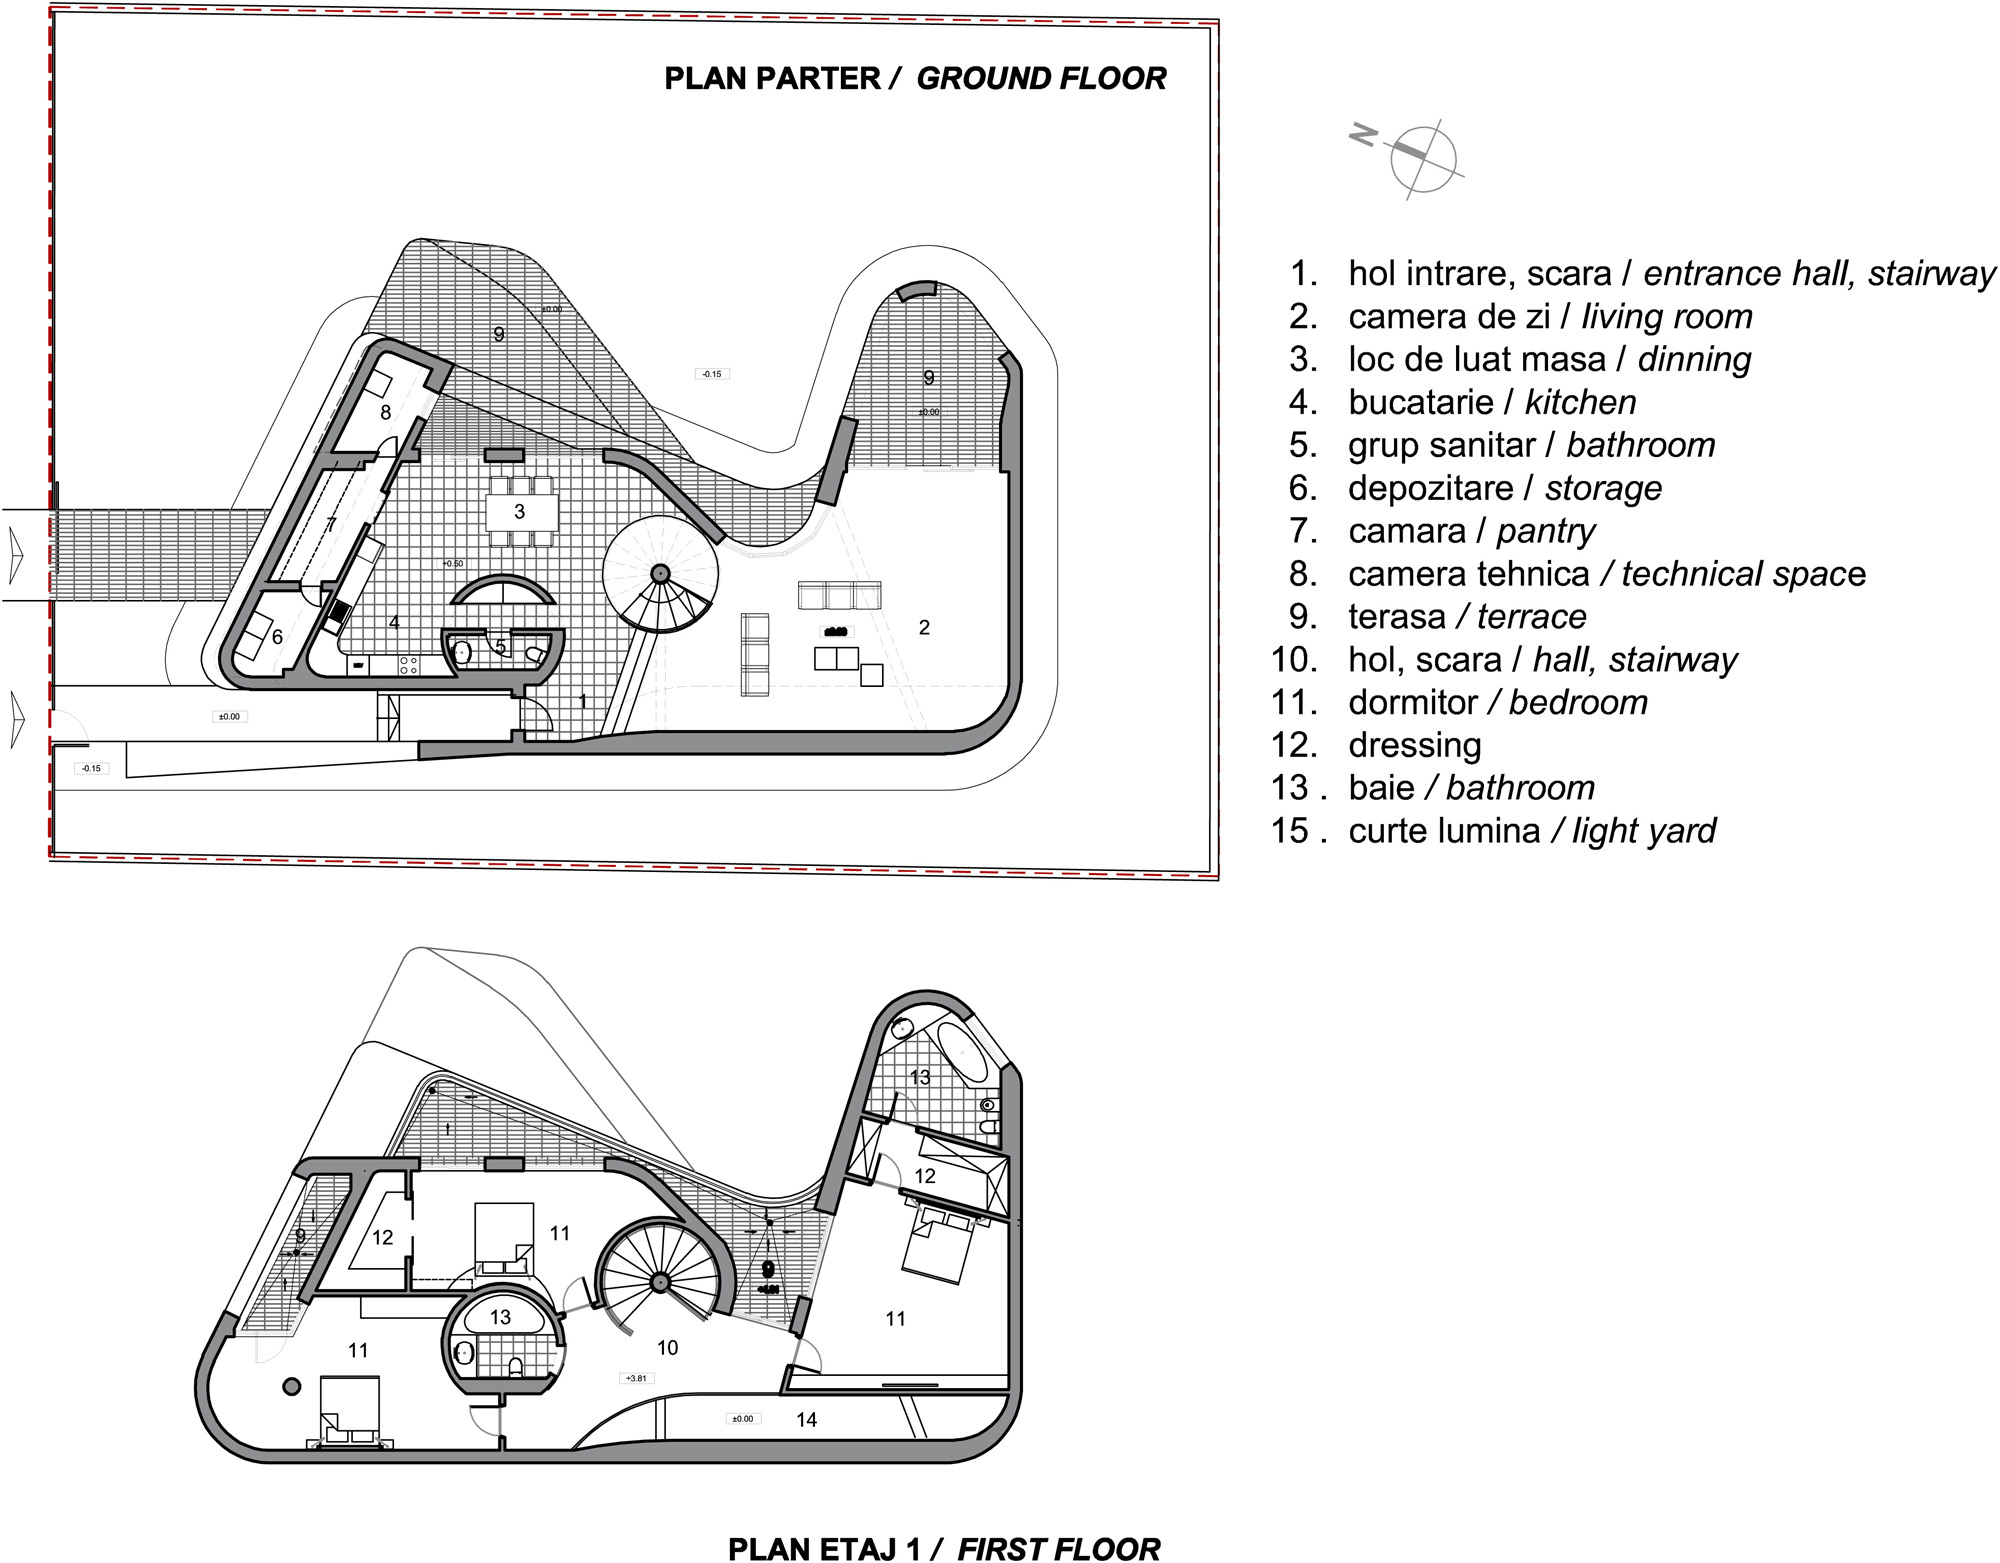 https://nbc-arhitect.ro/wp-content/uploads/2020/10/NBC-Arhitect-_-residences-_-Wing-House-_-Romania-_-plan_1.jpg